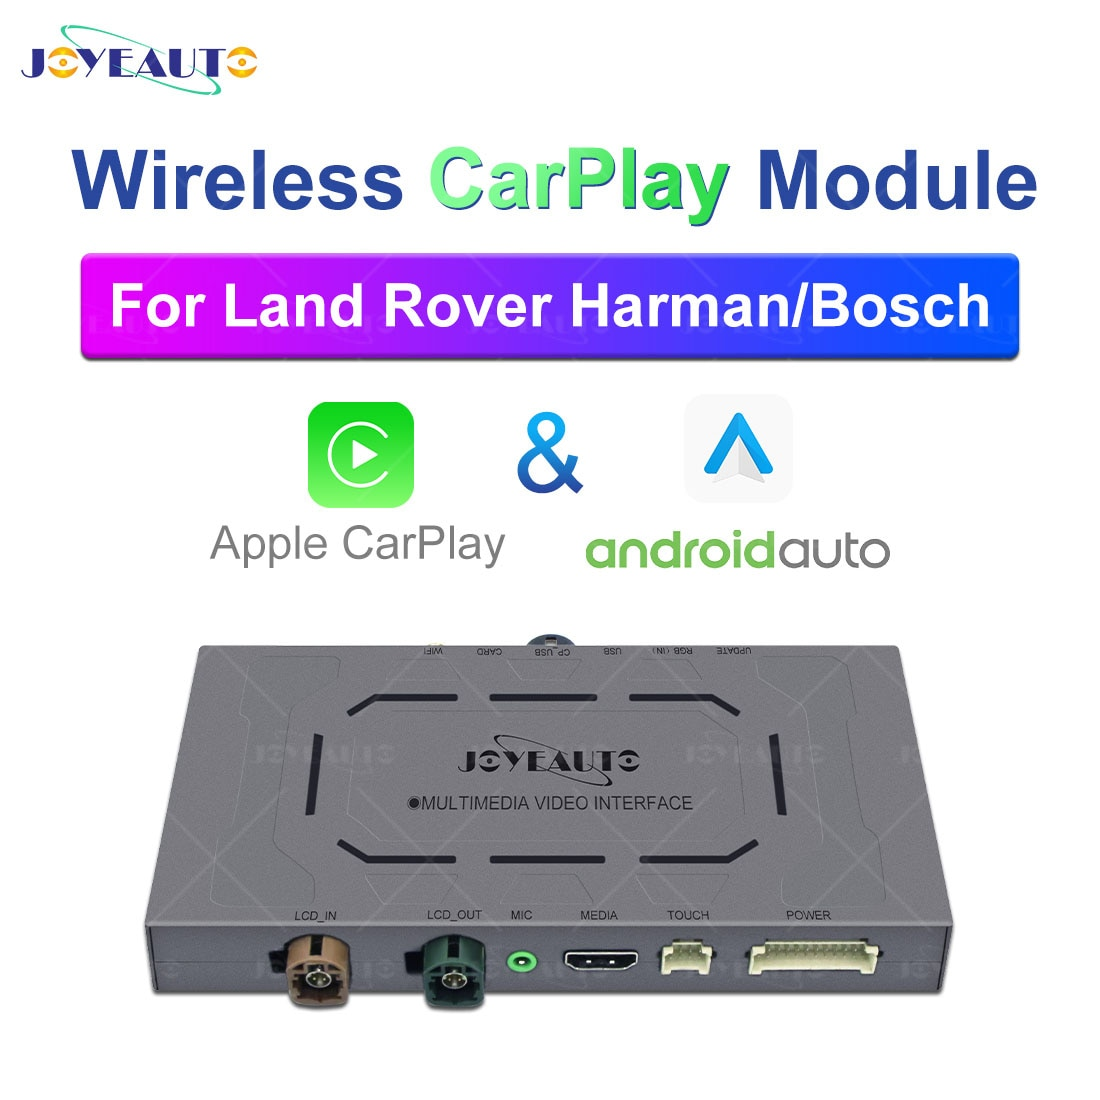 Promo JoyeAuto Wireless Apple Carplay Android Auto Car Module For Land Rover Evoque Discovery 5 Sport Harman Bosch Mirrorlink Decoder